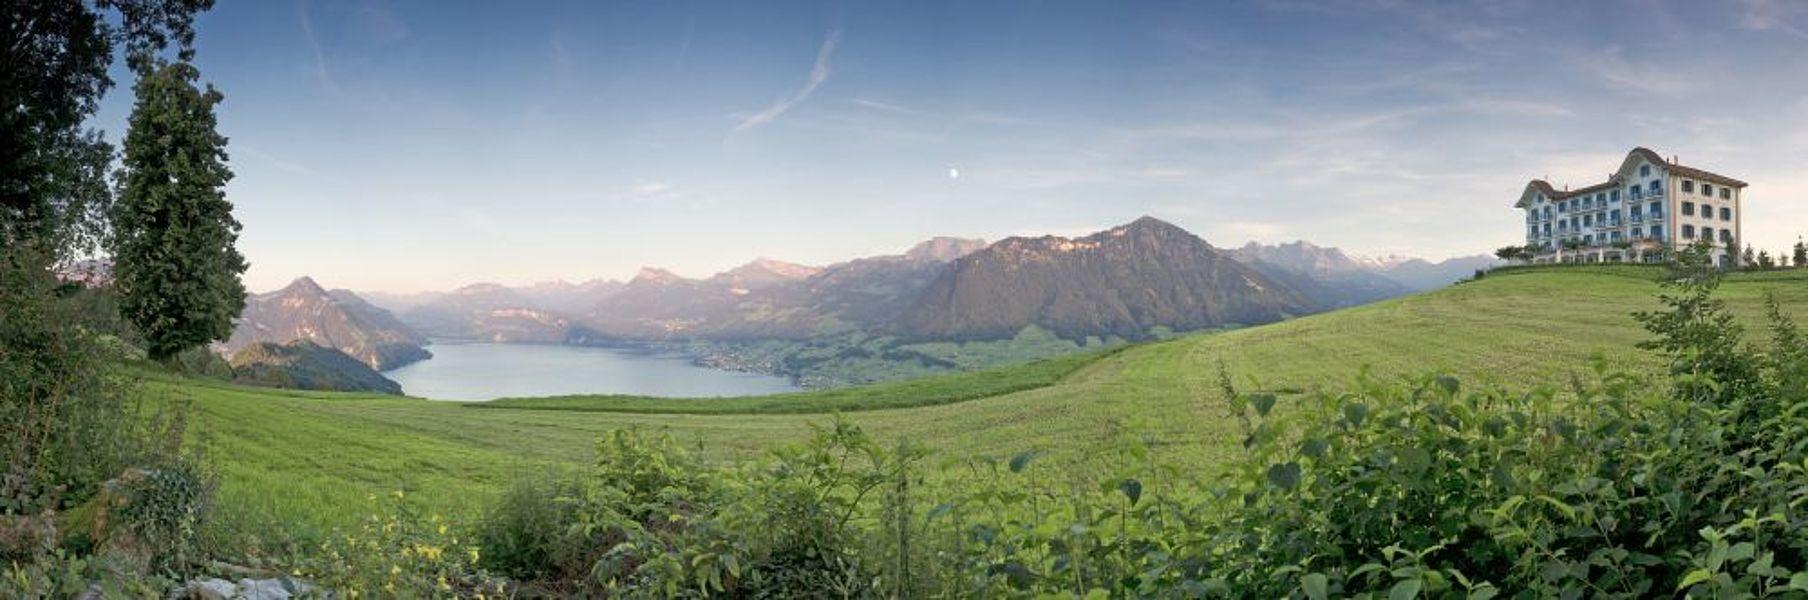 Hotel Villa Honegg tout privatinsel mieten - hotel villa honegg - schweiz - europa: atlantik